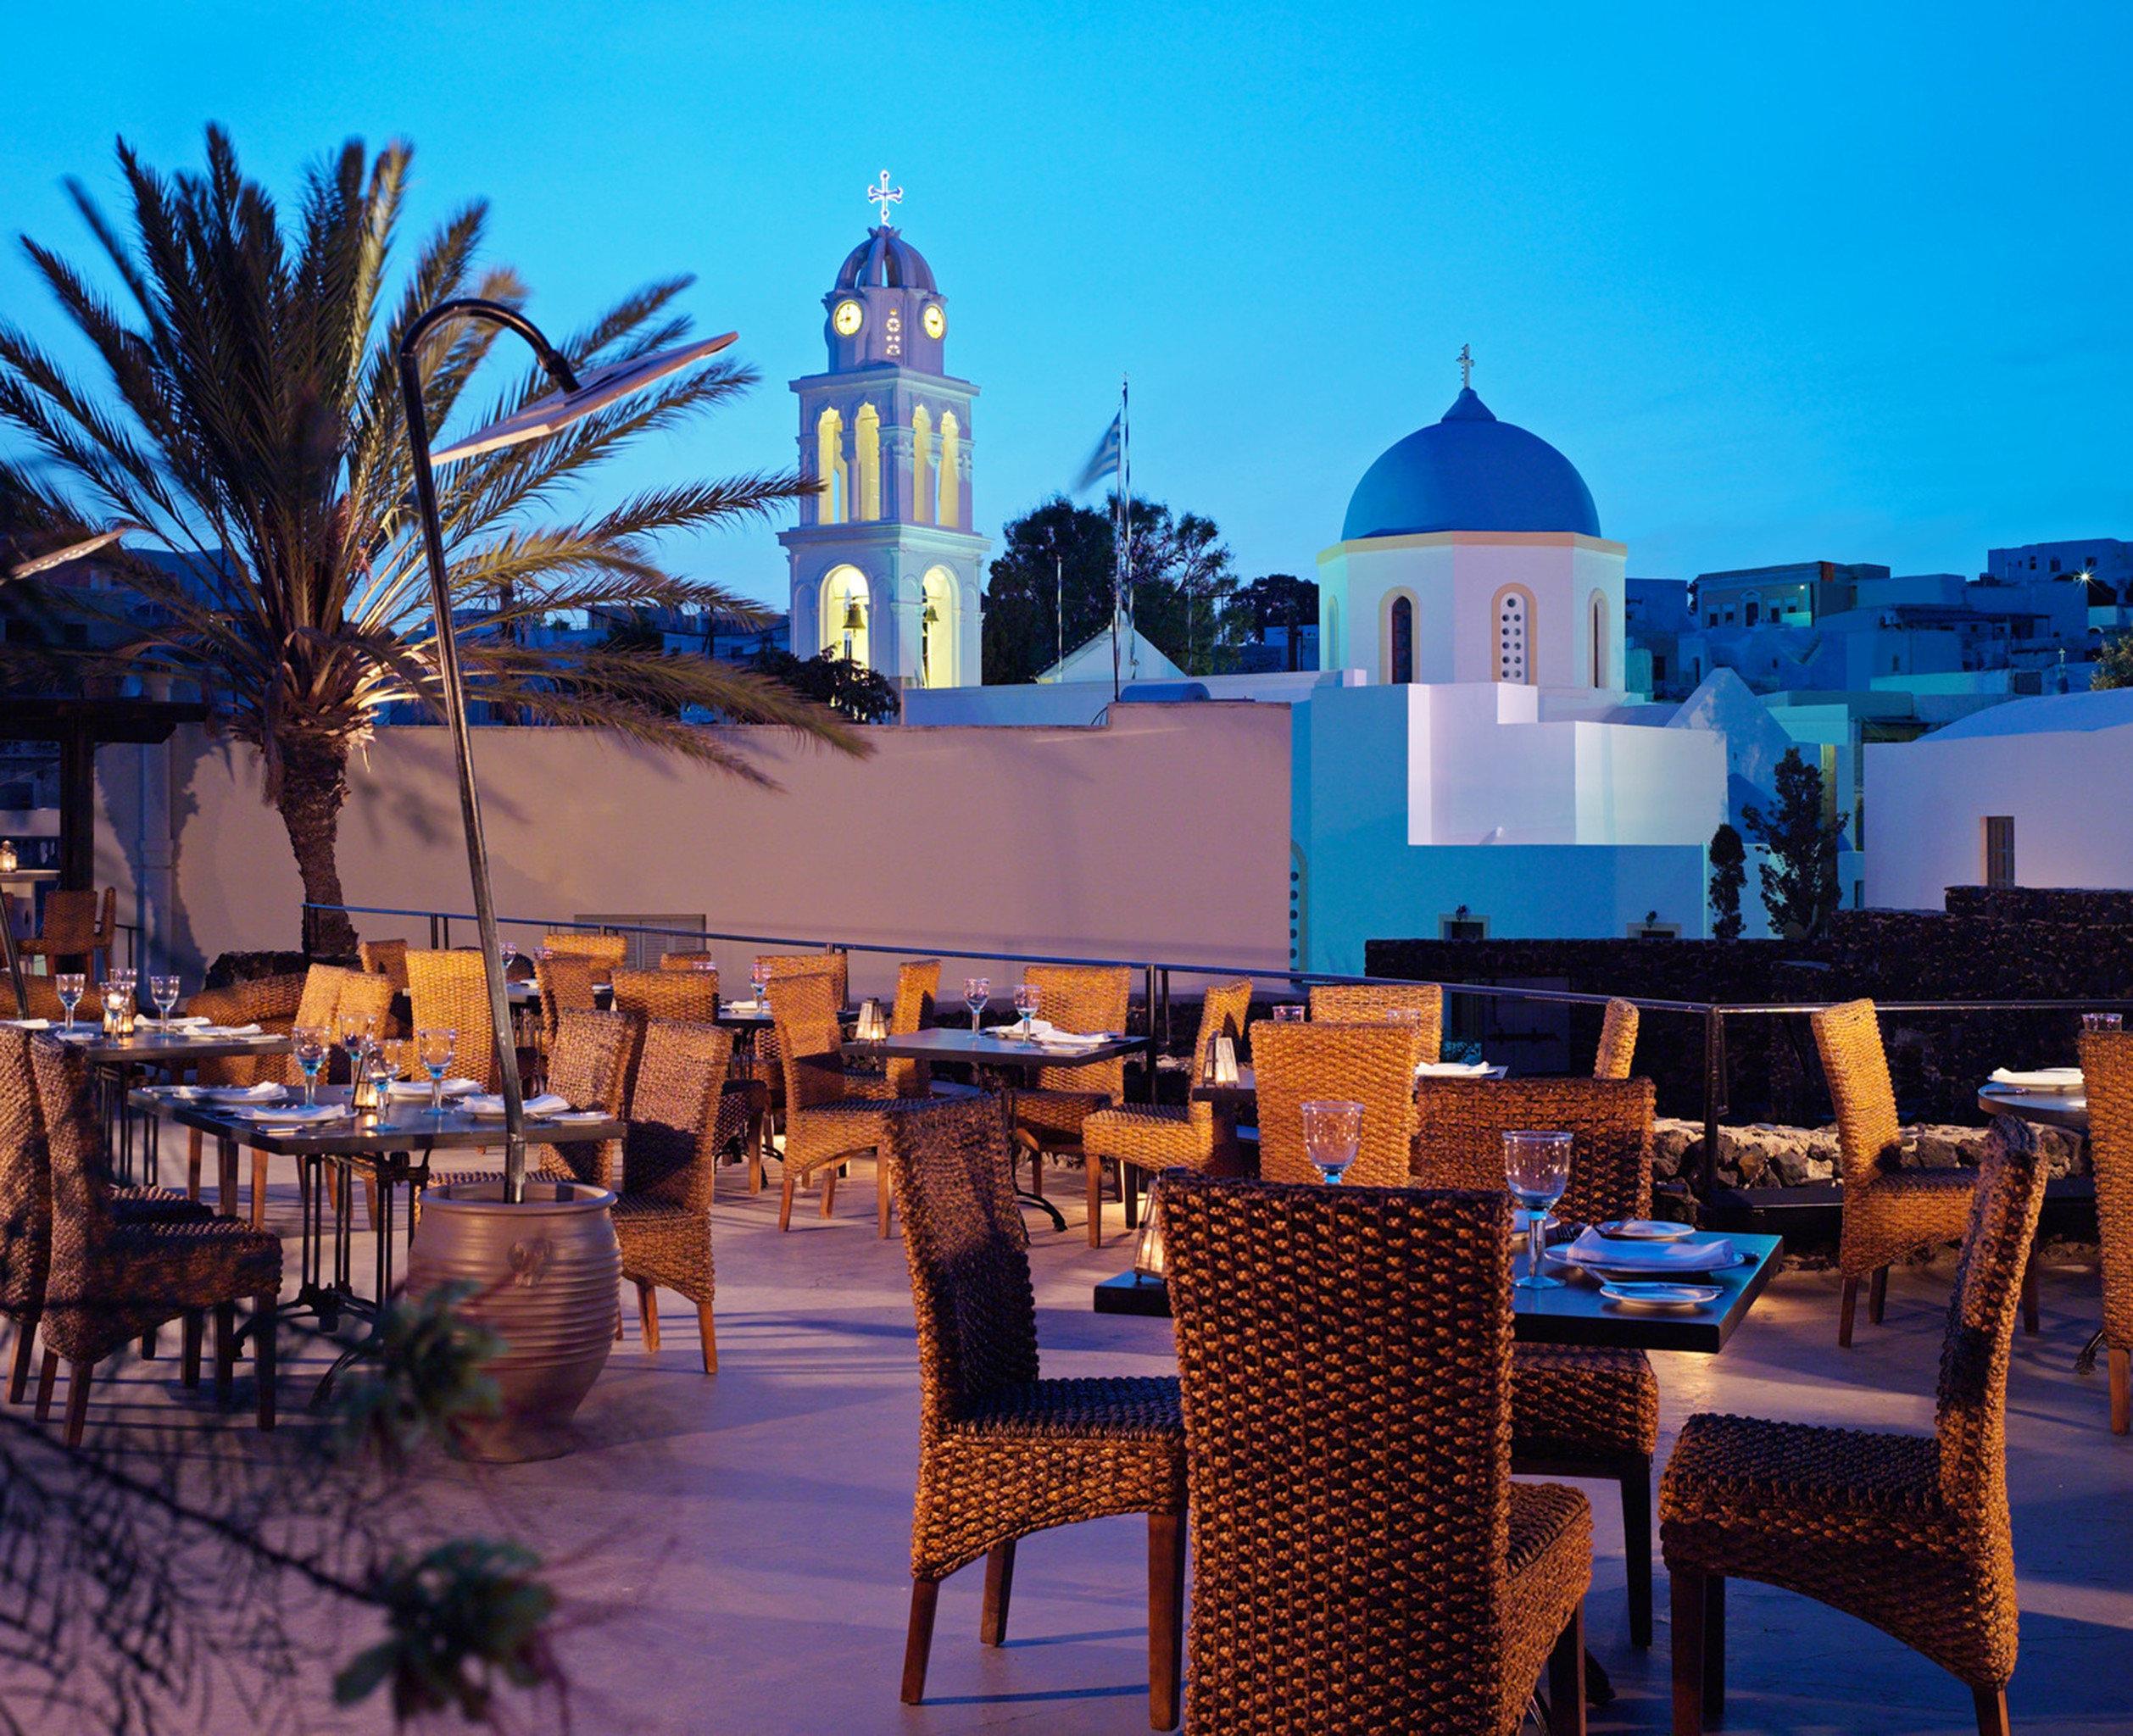 Bar Dining Drink Eat Luxury Romantic sky chair umbrella Resort restaurant evening palace surrounded